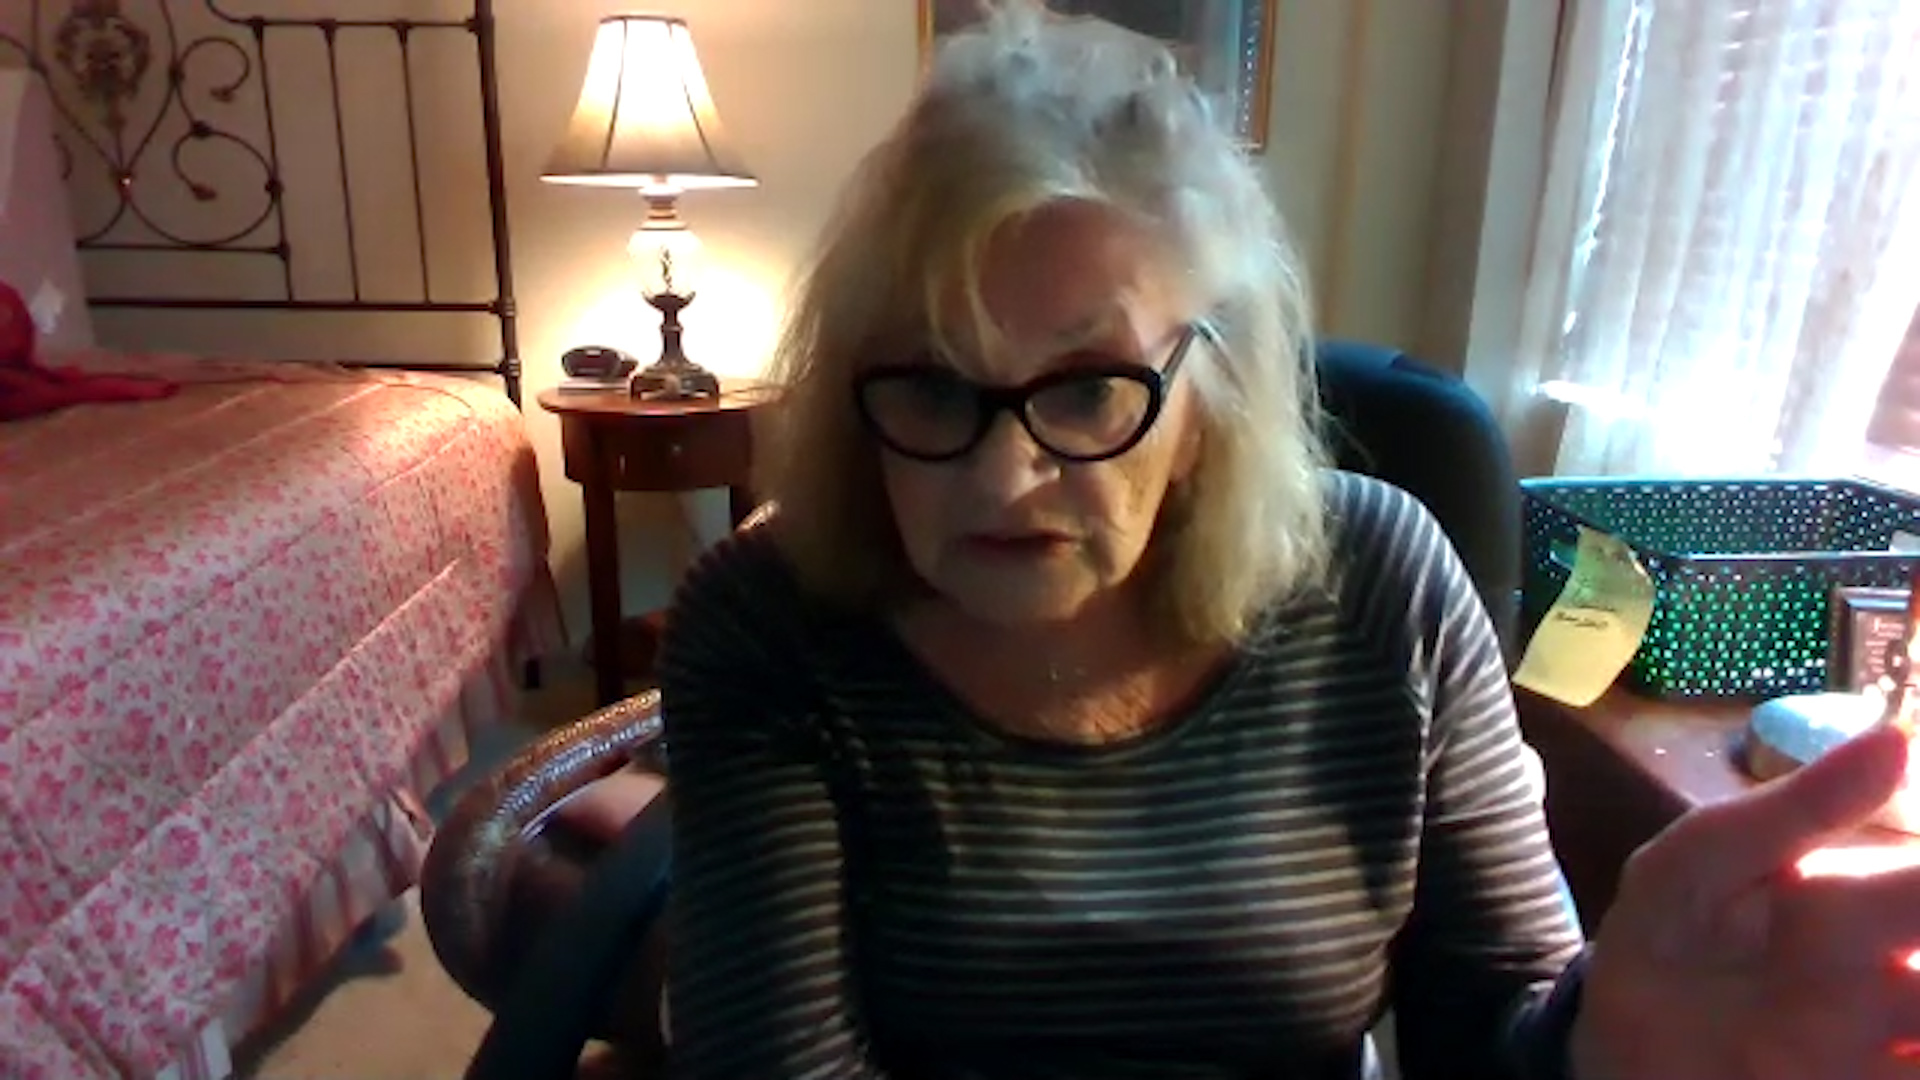 Dr. Miriam K. Kassenoff, Director of the Holocaust Institute at University of Miami